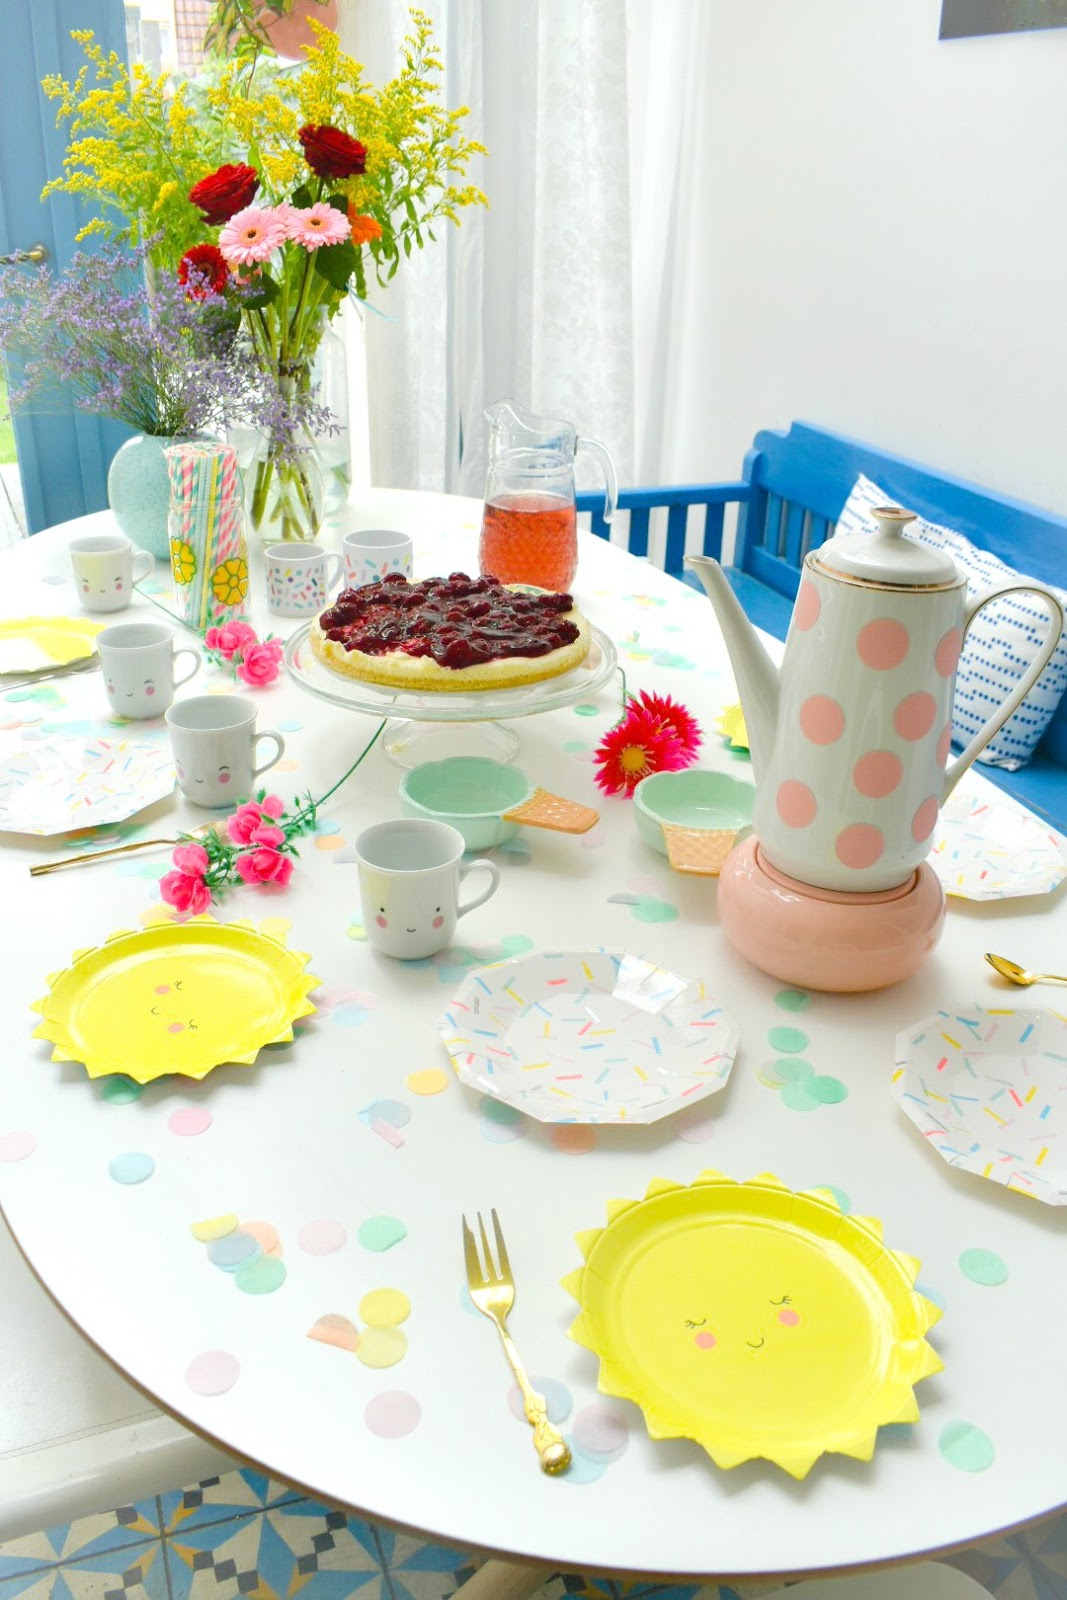 Confetti balloons blog feestelijke tafel - Feestelijke tafels ...